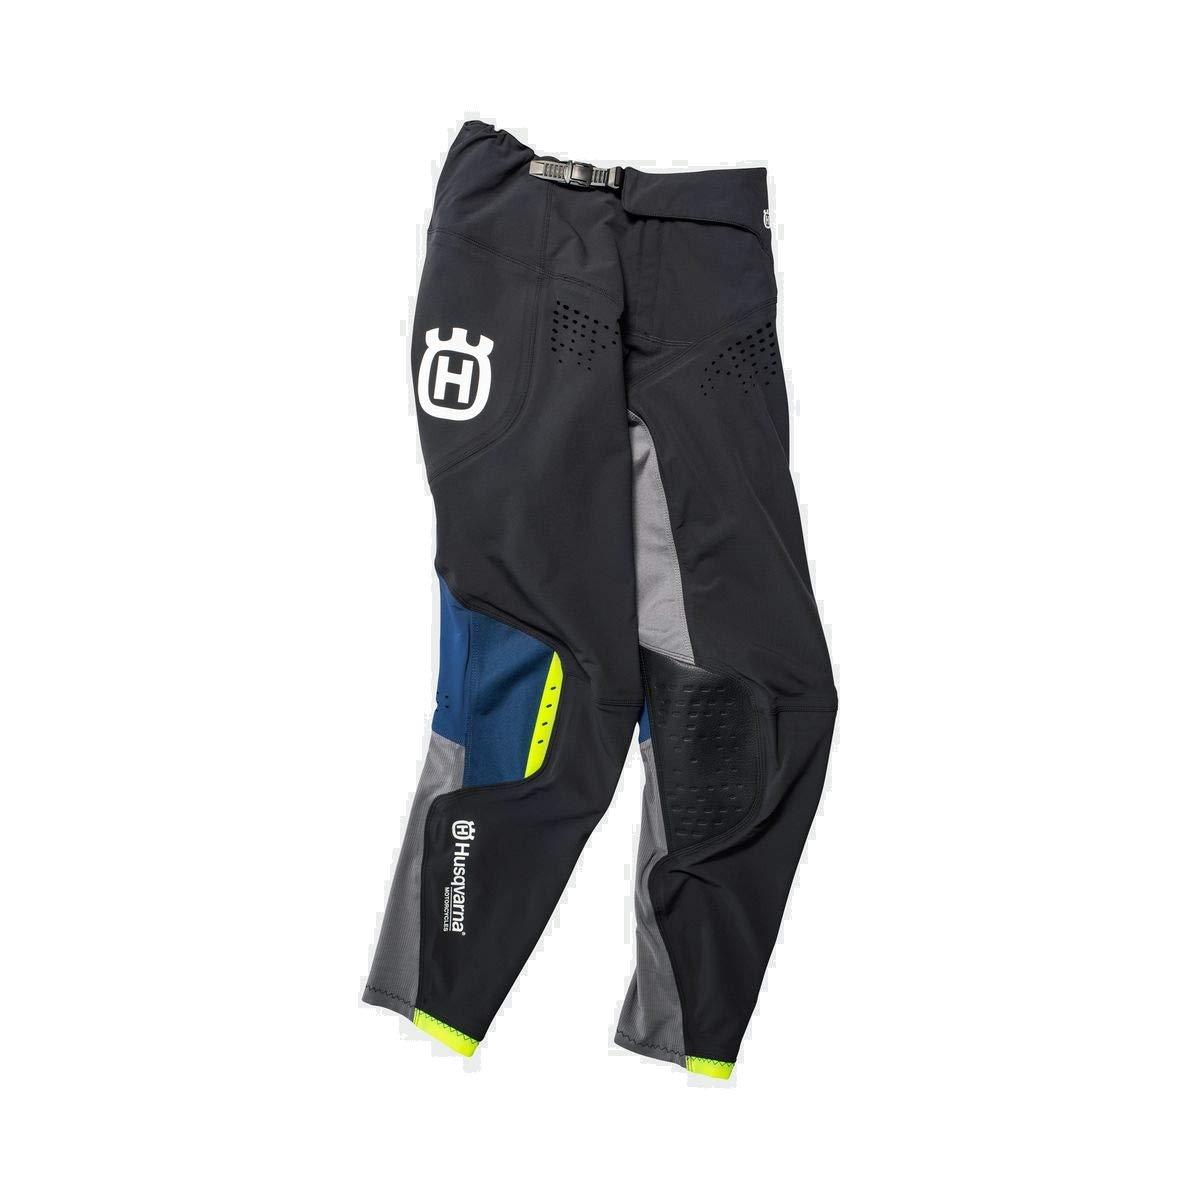 XXL//38 Husqvarna Railed Pants 3HS192250